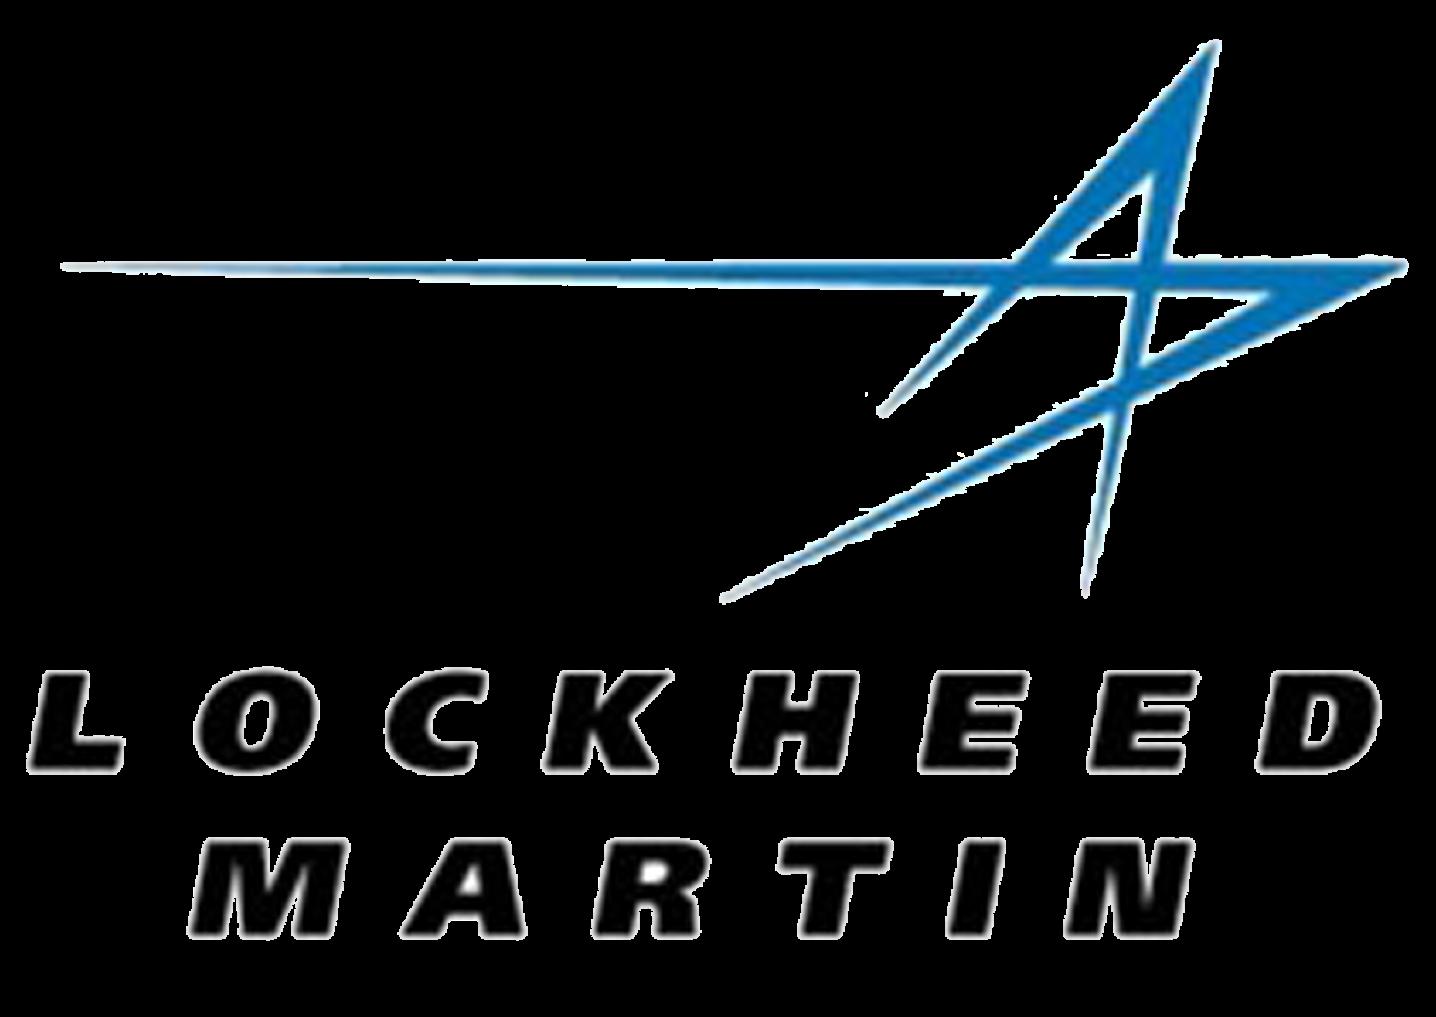 Lockheed square.png